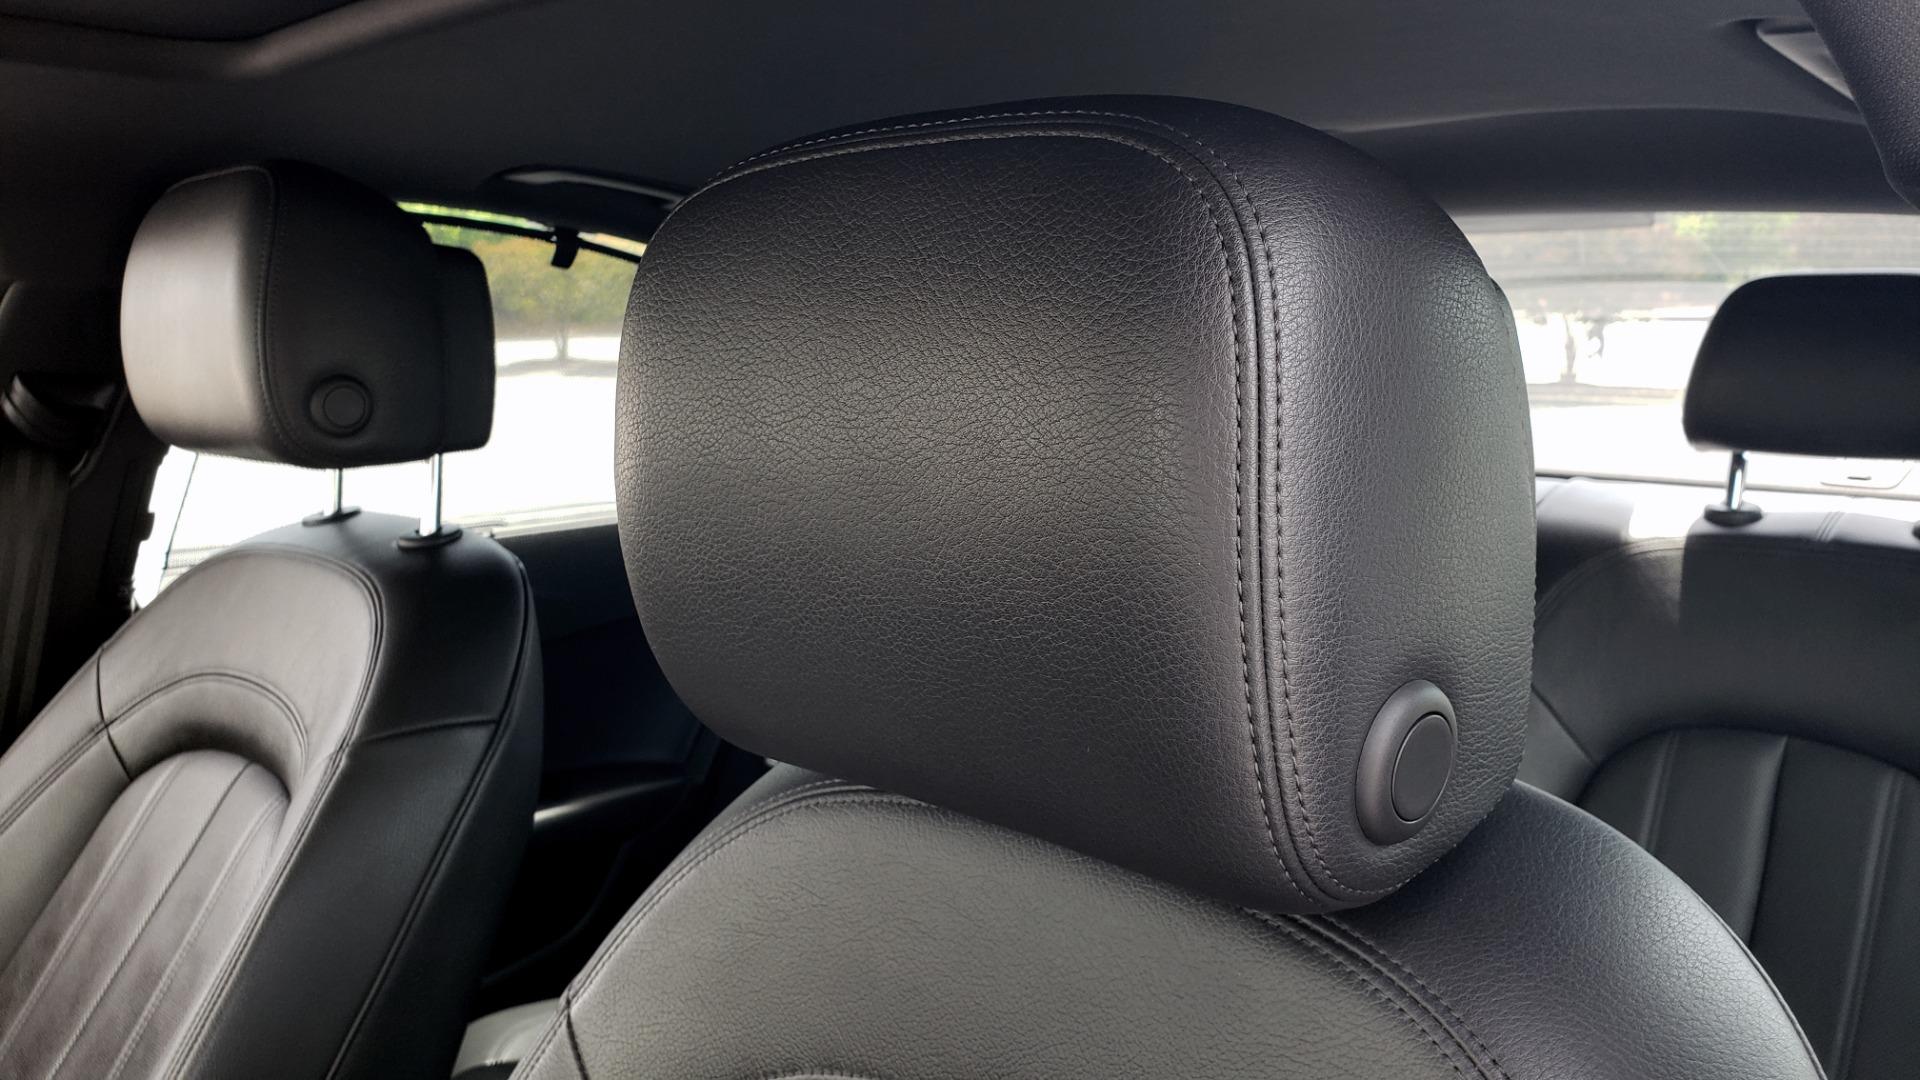 Used 2017 Audi A6 PRESTIGE SEDAN 3.0T / NAV / SUNROOF / BLACK OPTIC / CLD WTHR / REARVIEW for sale $30,797 at Formula Imports in Charlotte NC 28227 63